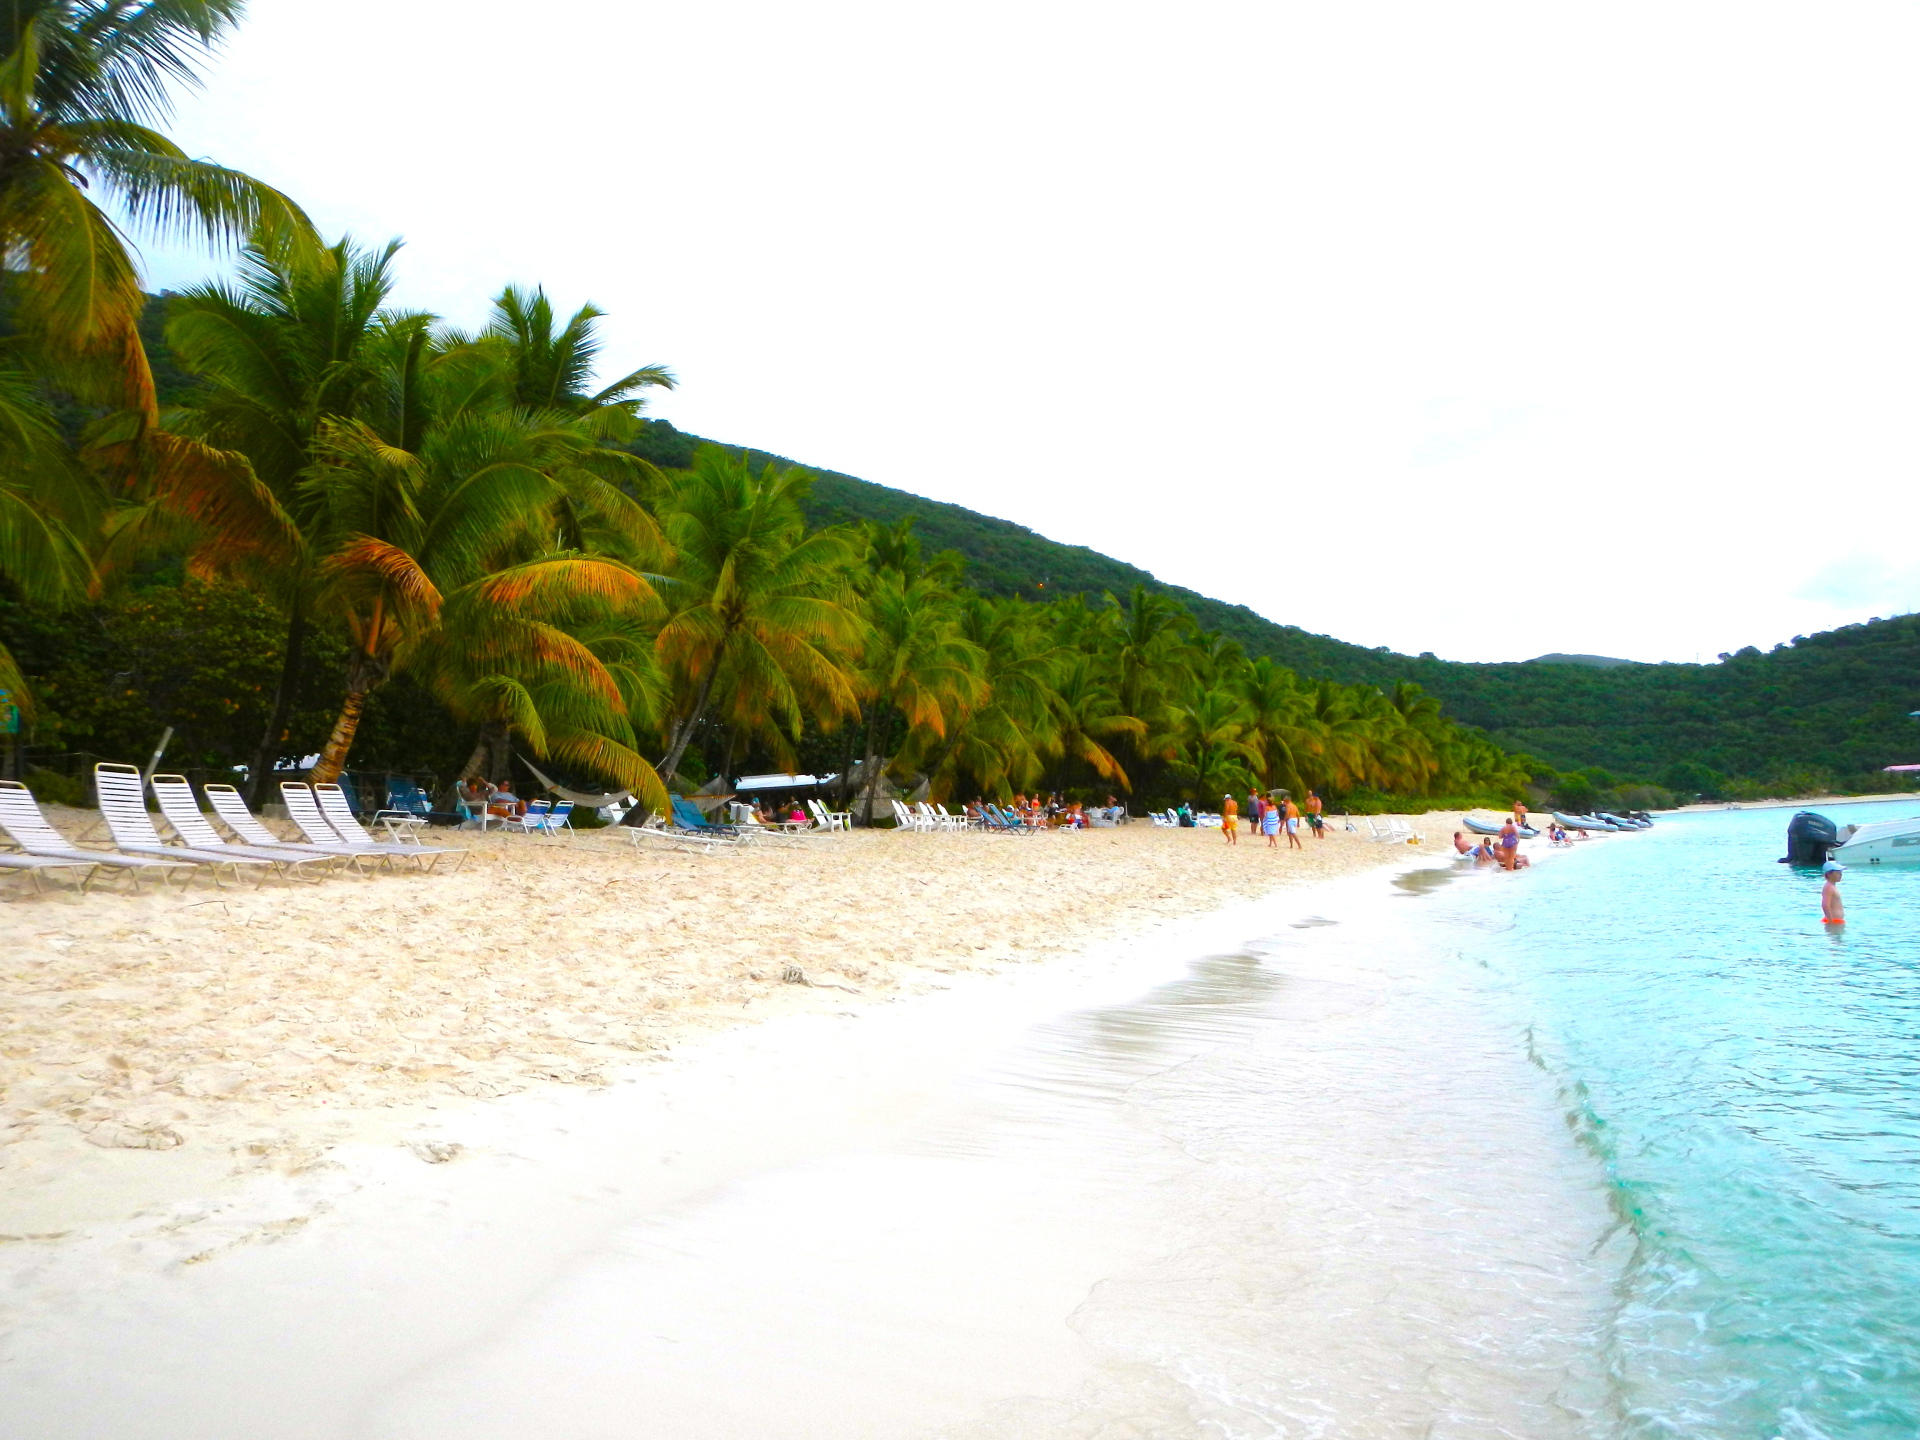 island, gertrude's, trees, beach